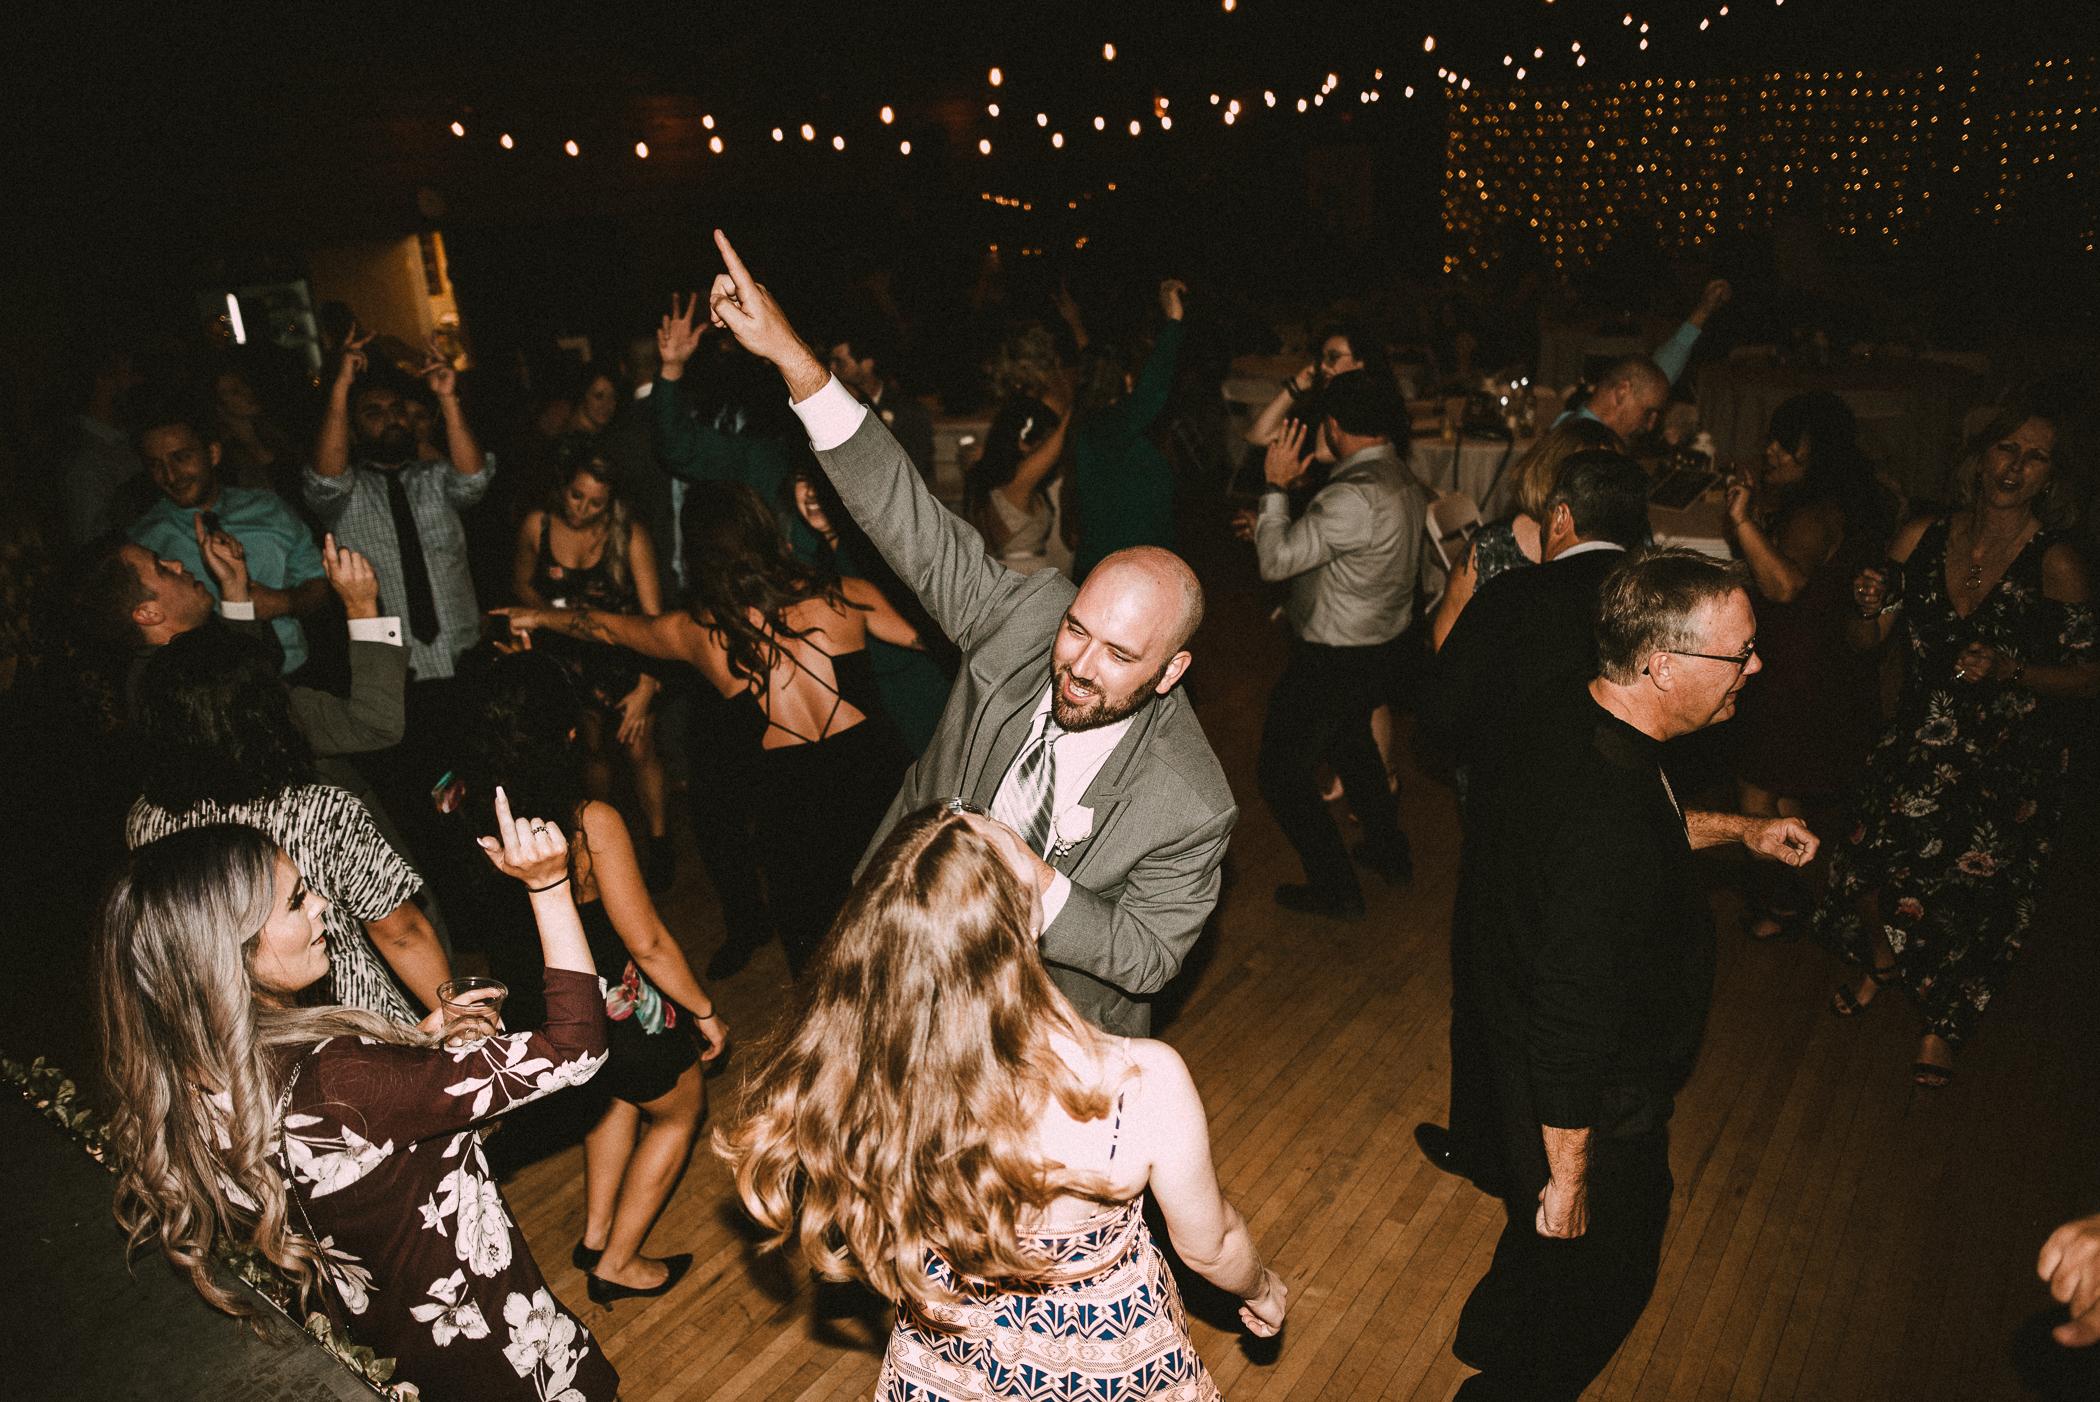 dance floor flash photos vancouver wedding photographer